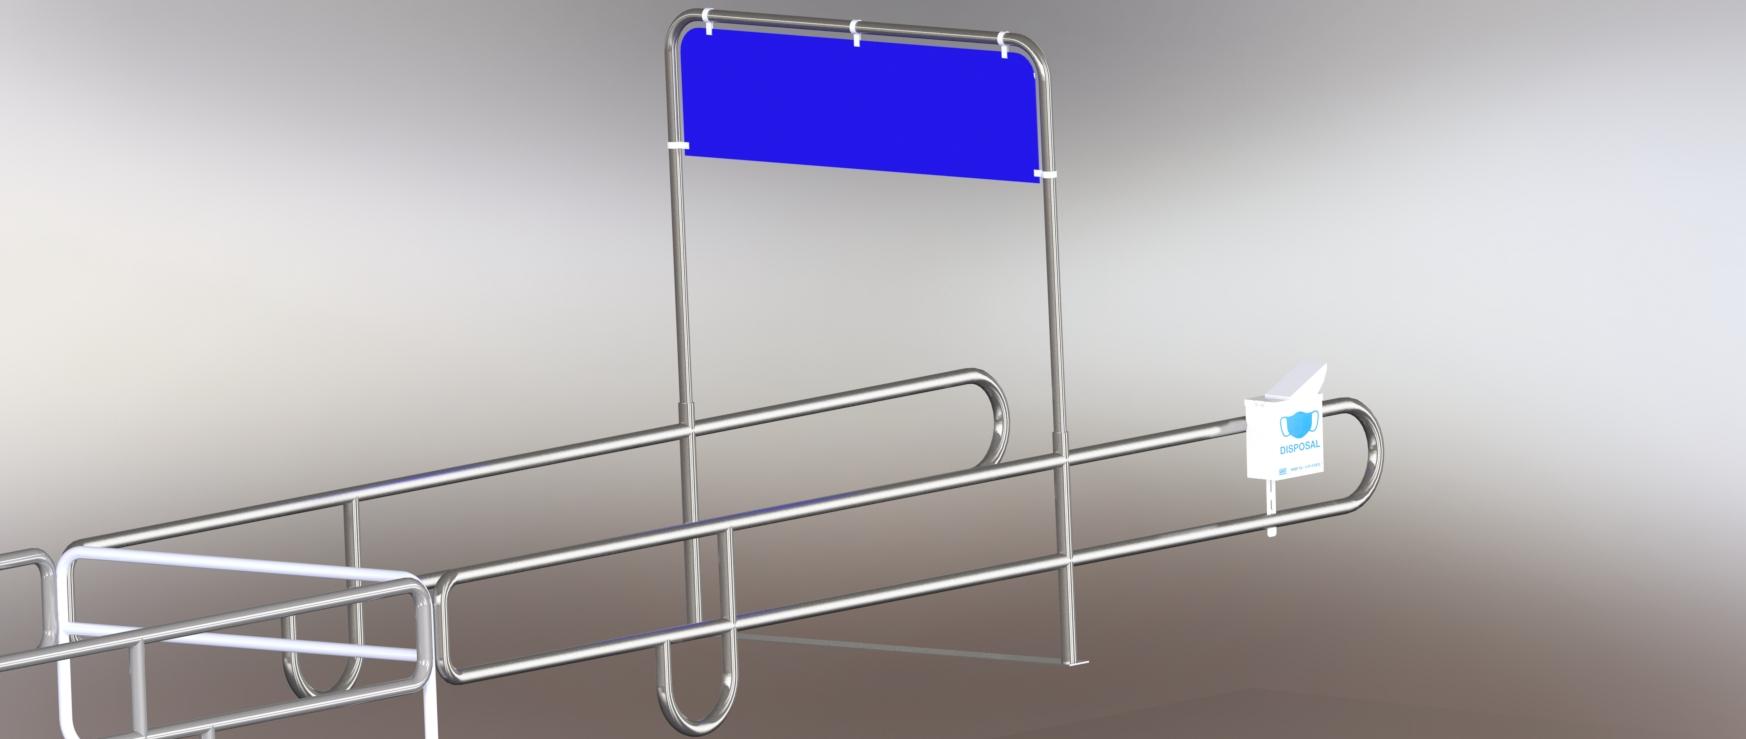 Mask Disposal Can, Cart Corral